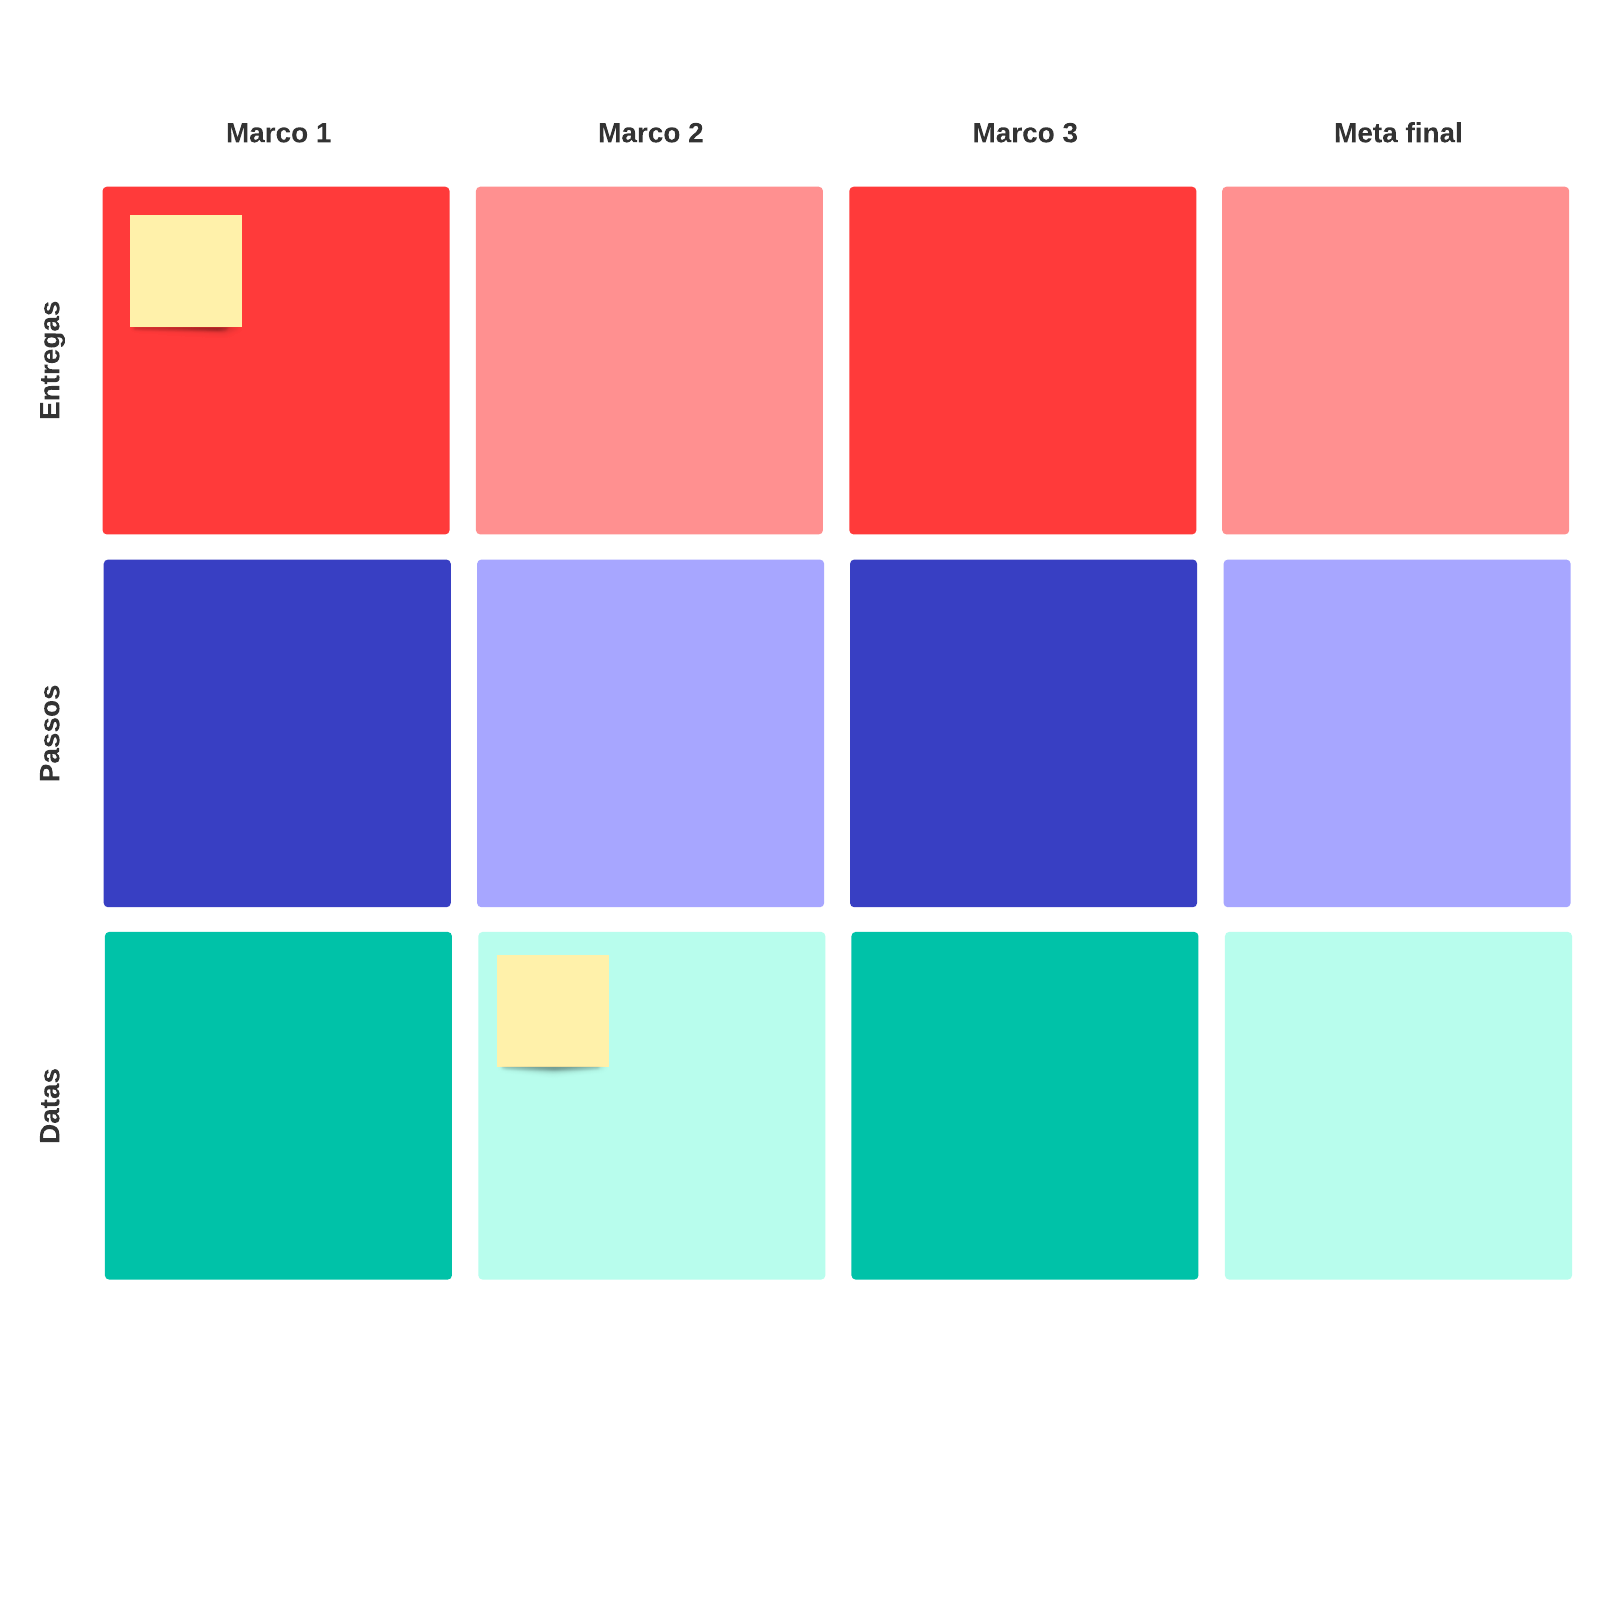 modelo de gráfico de marcos